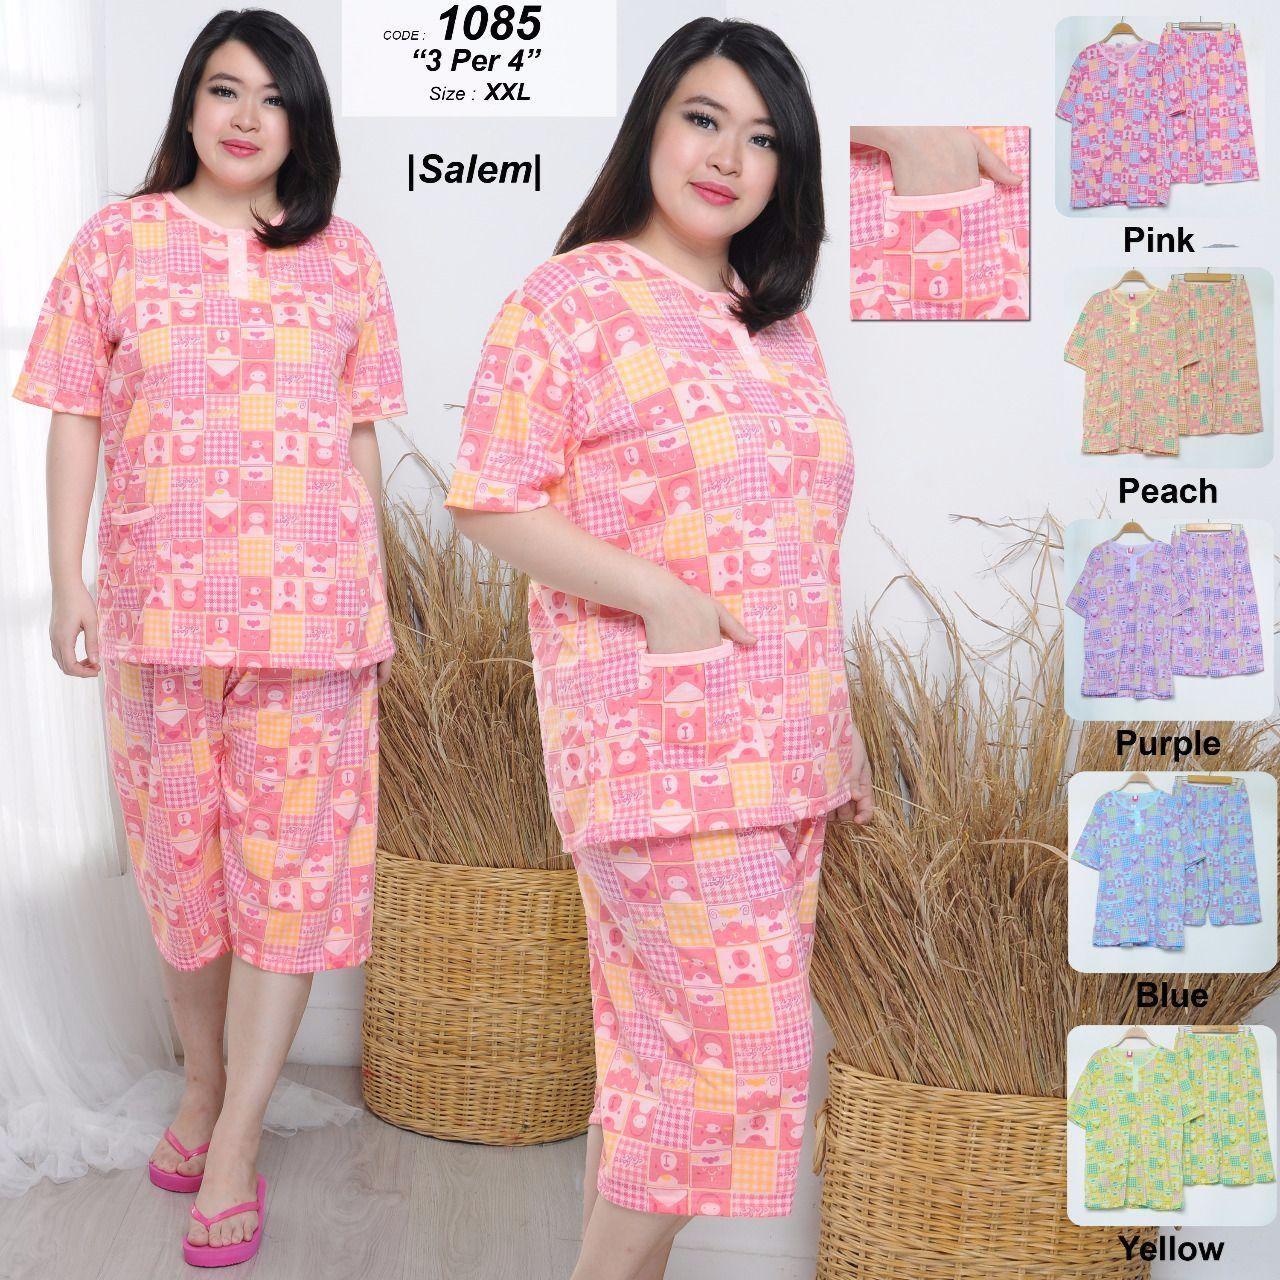 COD Lilipop Baju Tidur Wanita Pendek Jumbo Babydoll Piyama Sleepwear Bigsize 1085